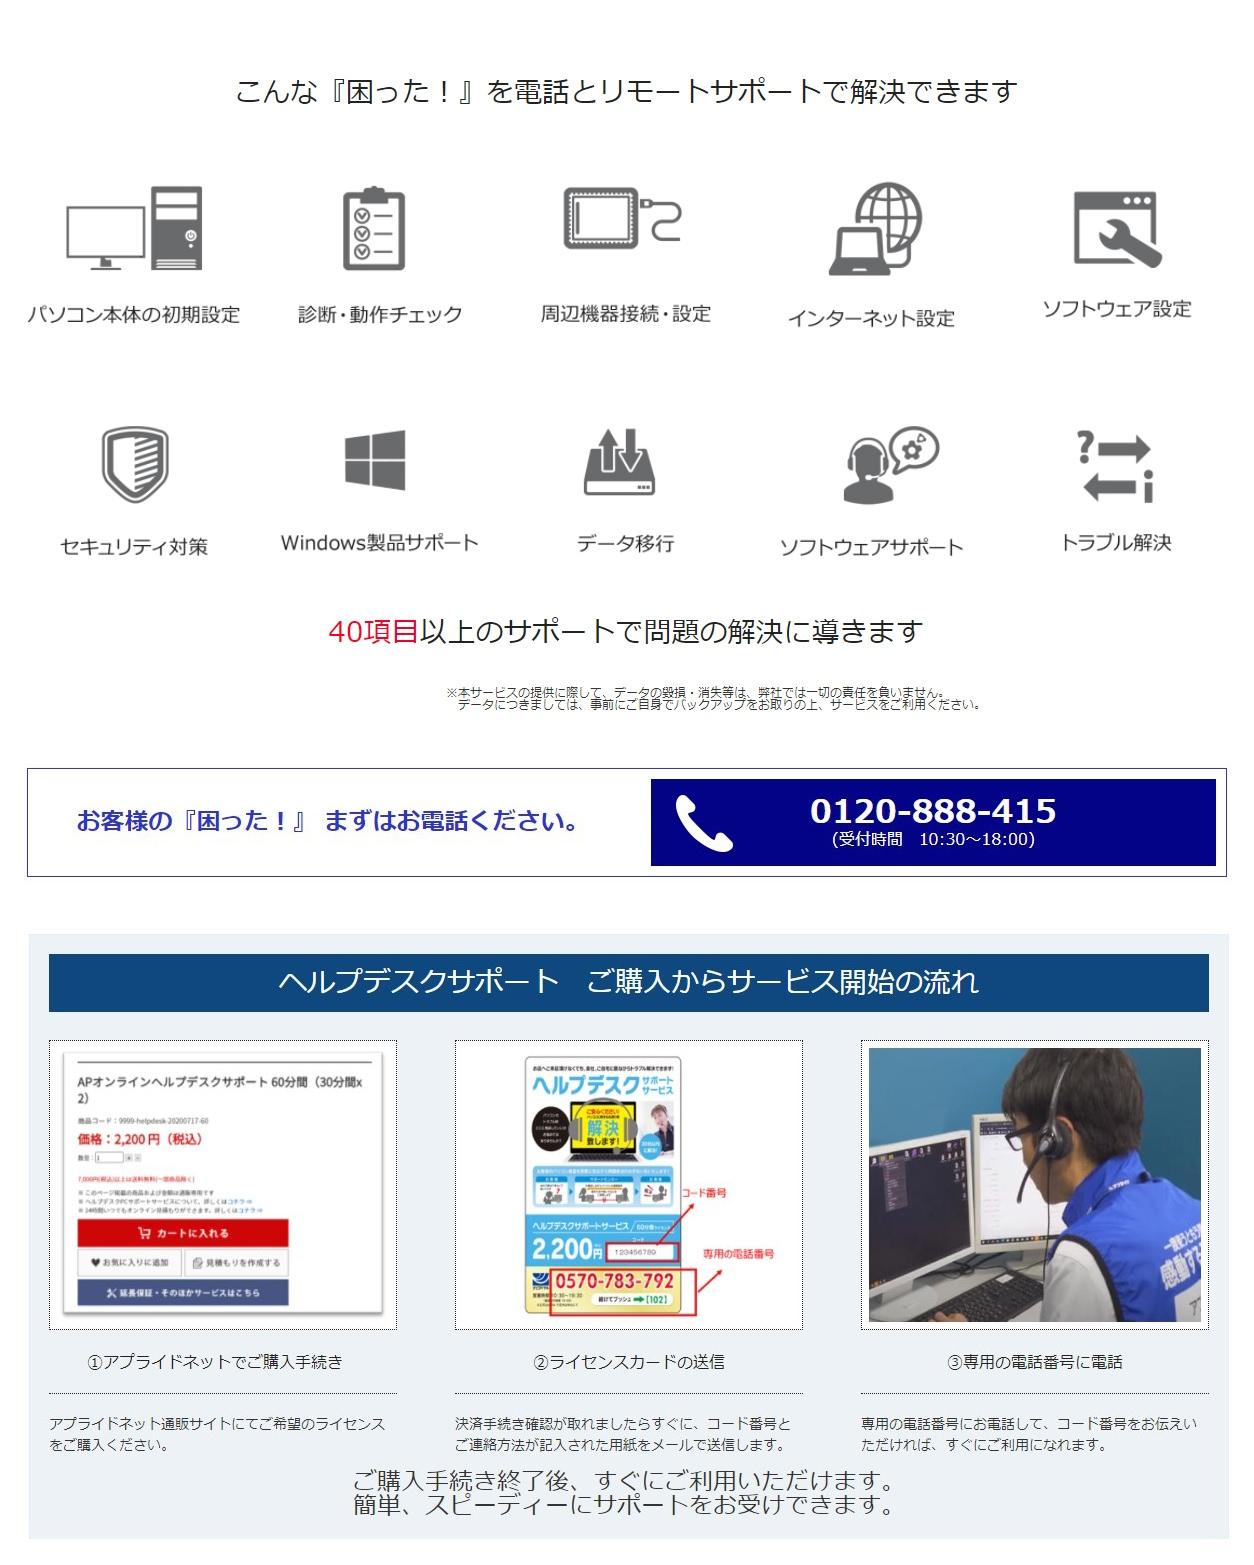 APオンラインヘルプデスクサポート